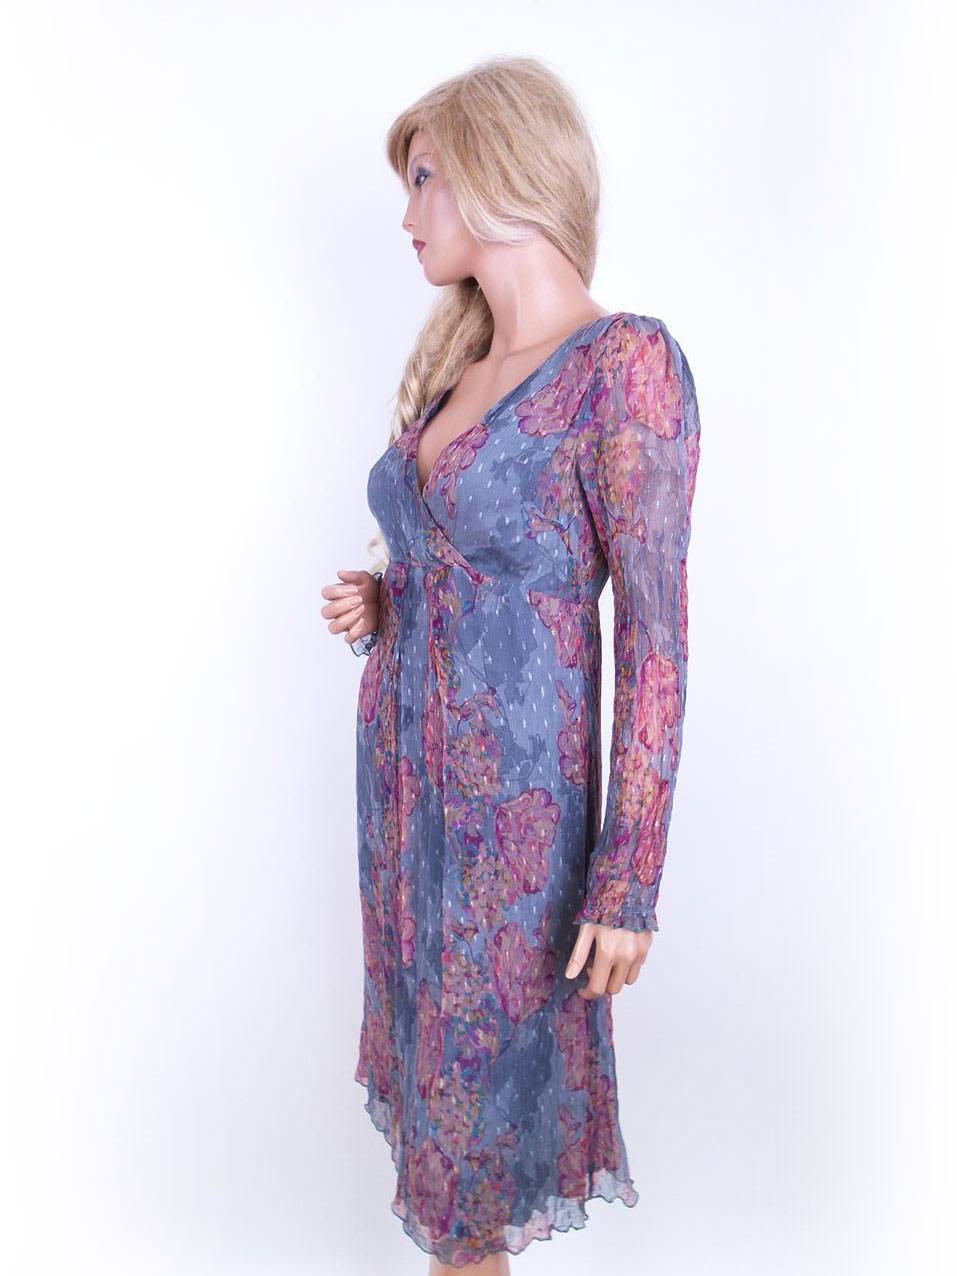 3aaa355d99ea ... Noa Noa størrelse M kjole romantisk pastel blomster.